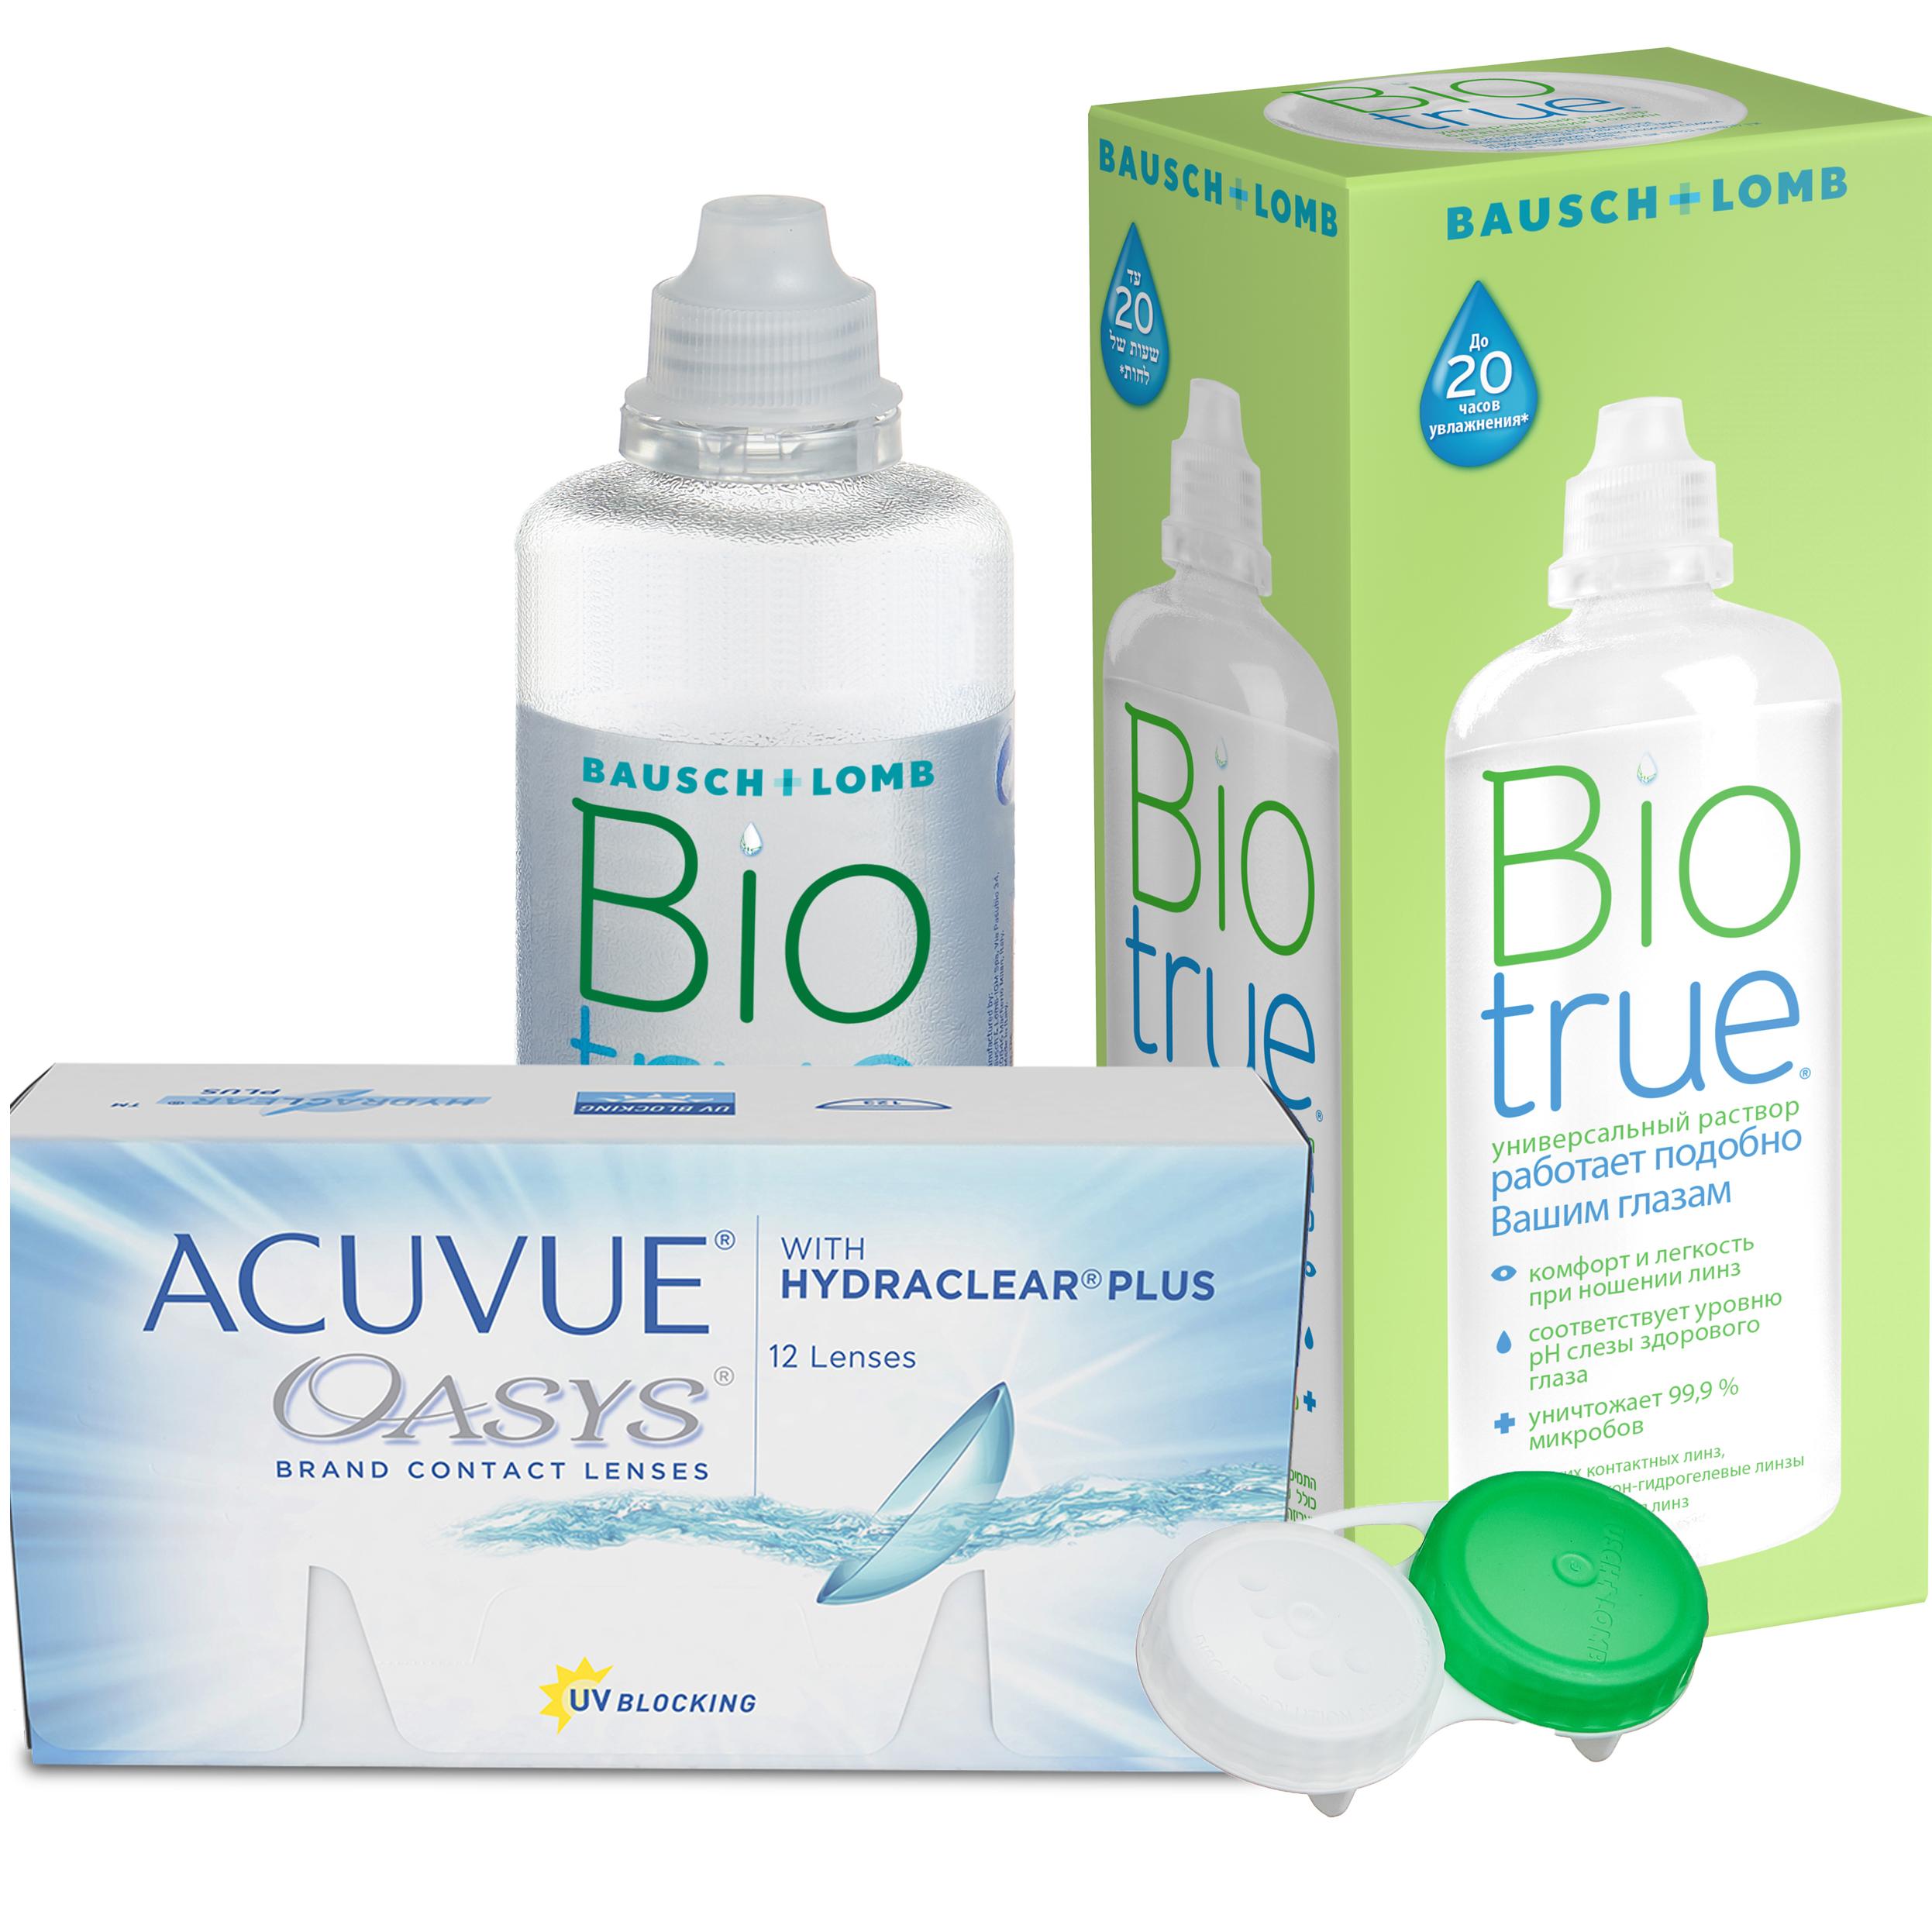 Купить Oasys with Hydraclear Plus 12 линз + Biotrue, Контактные линзы Acuvue Oasys with Hydraclear Plus 12 линз R 8.8 +7, 50 + Biotrue 300 мл